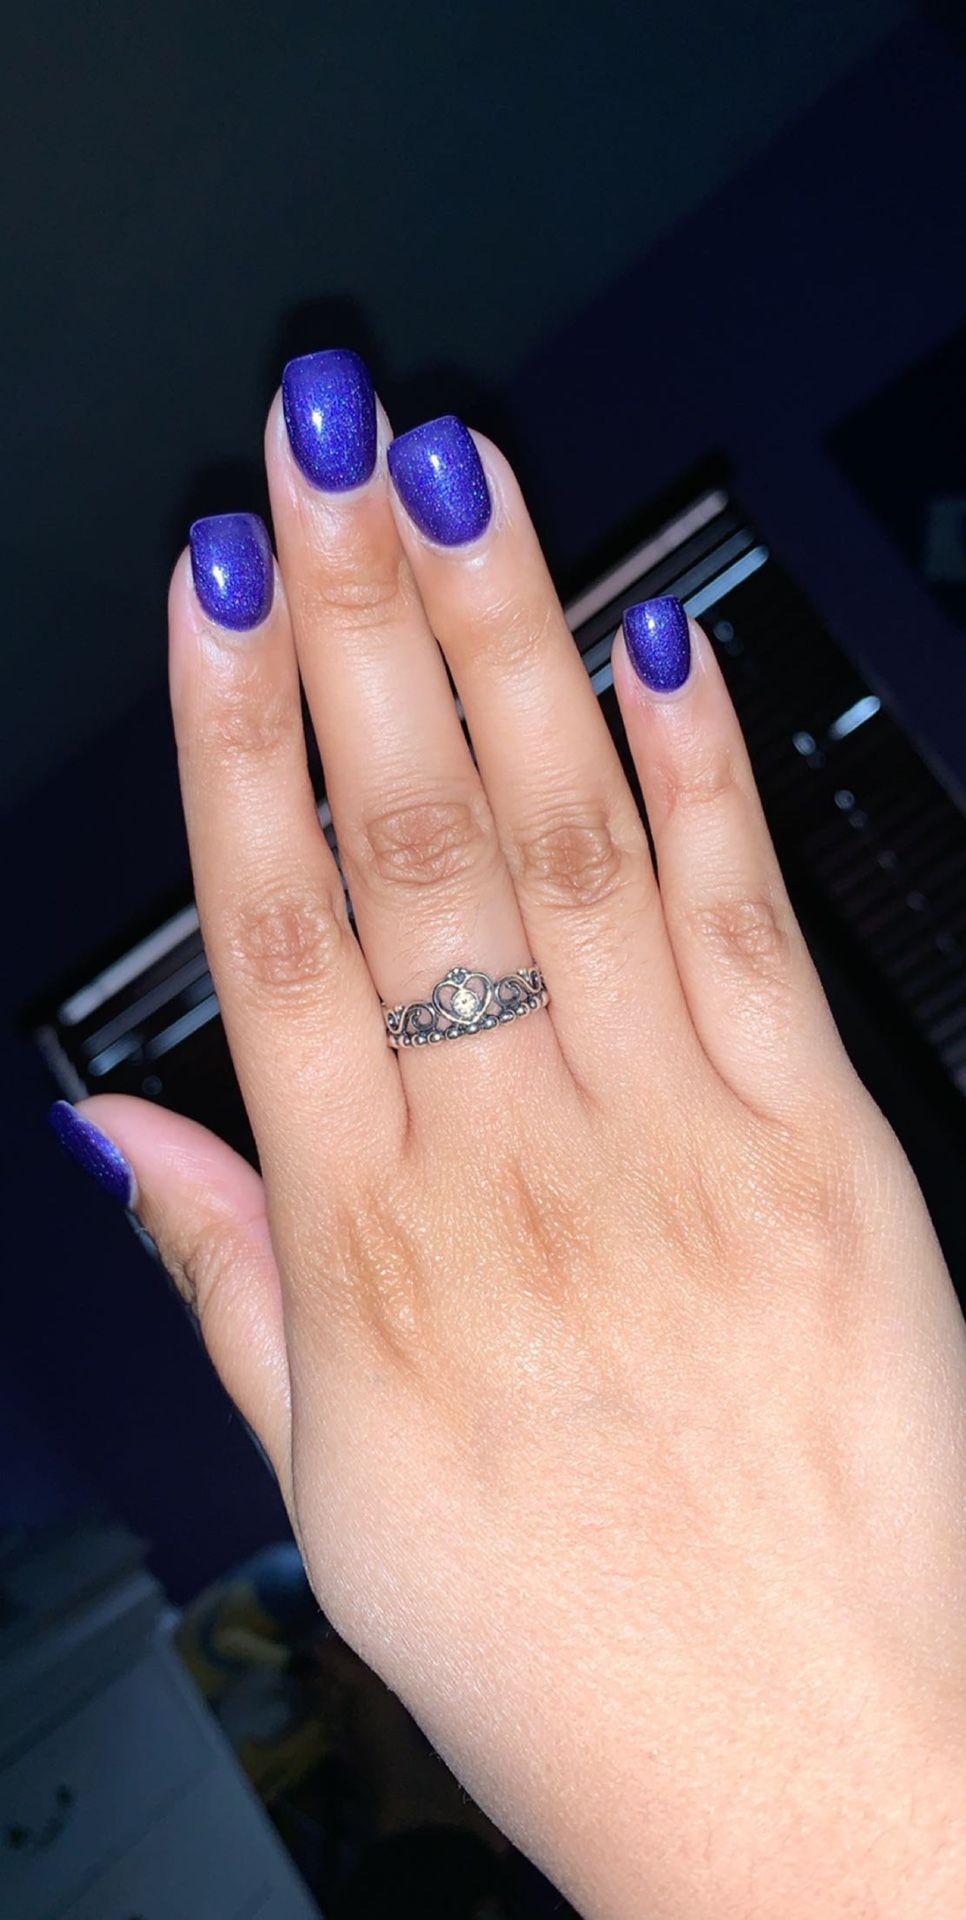 Pandora Princess Ring Size 7